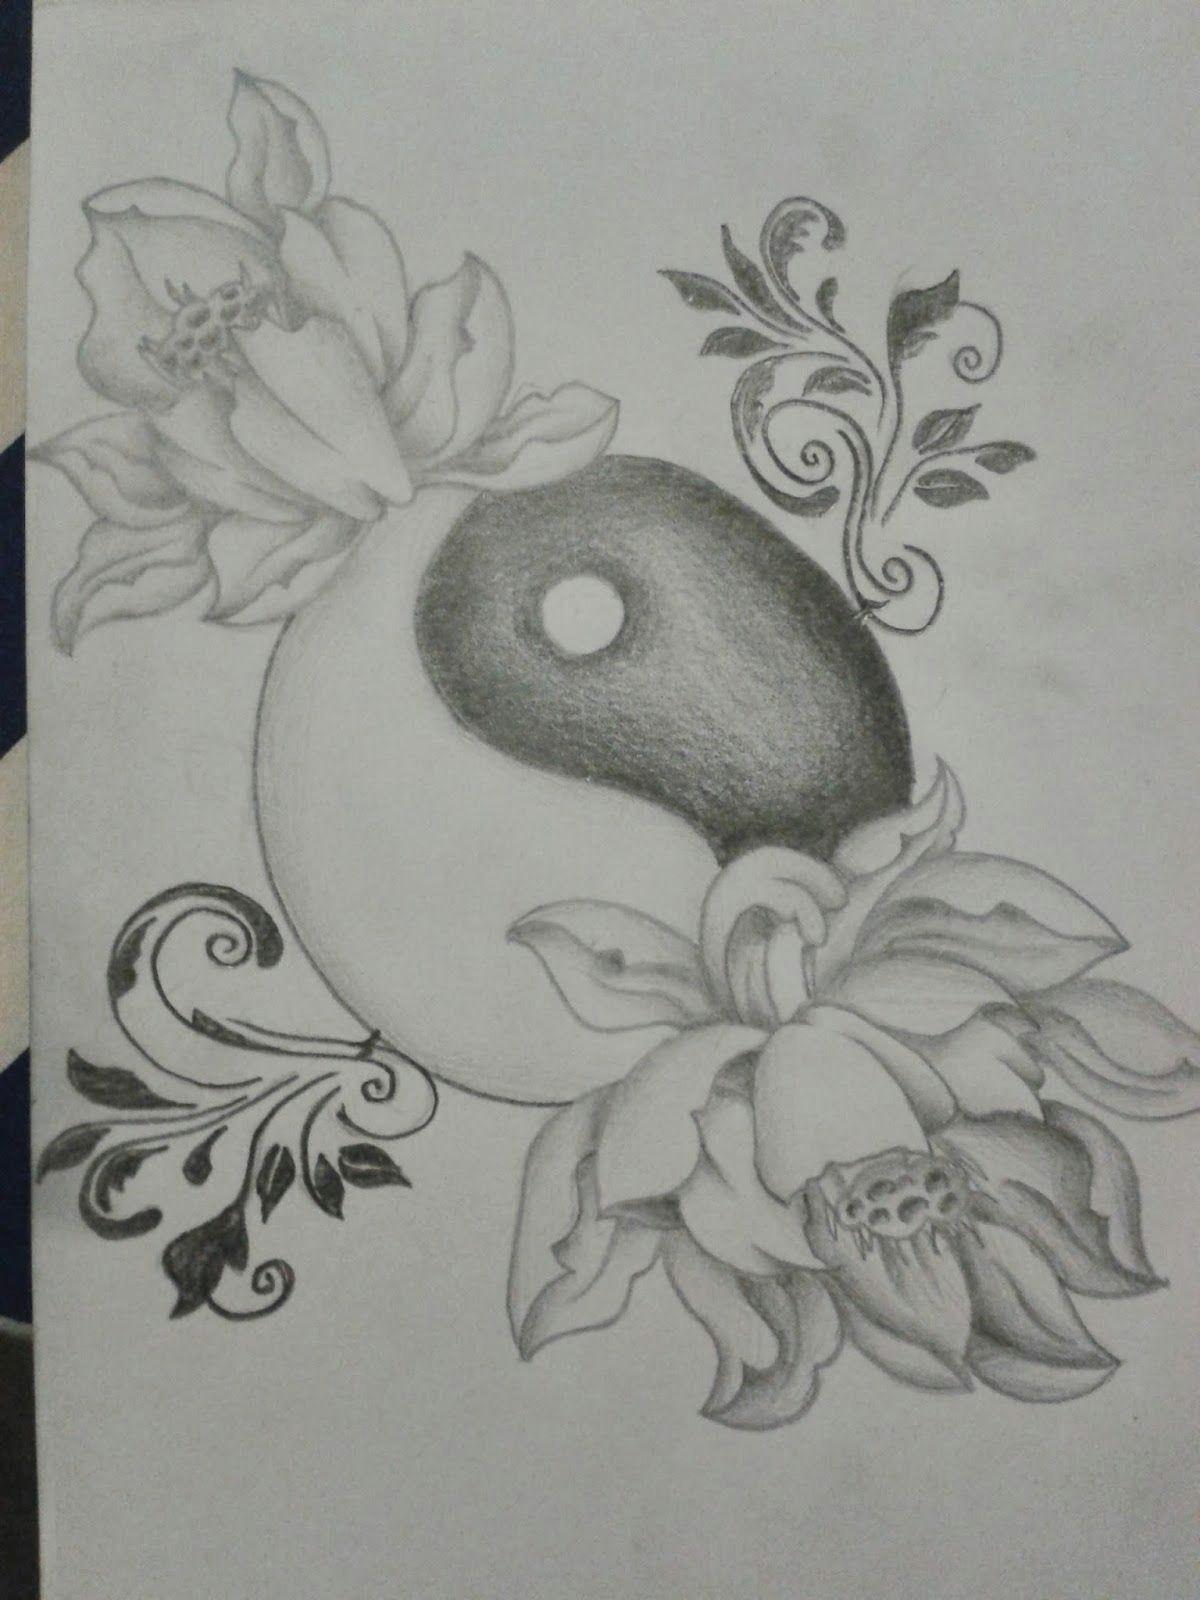 r3dwall art lotus flower yin yang tattoo design